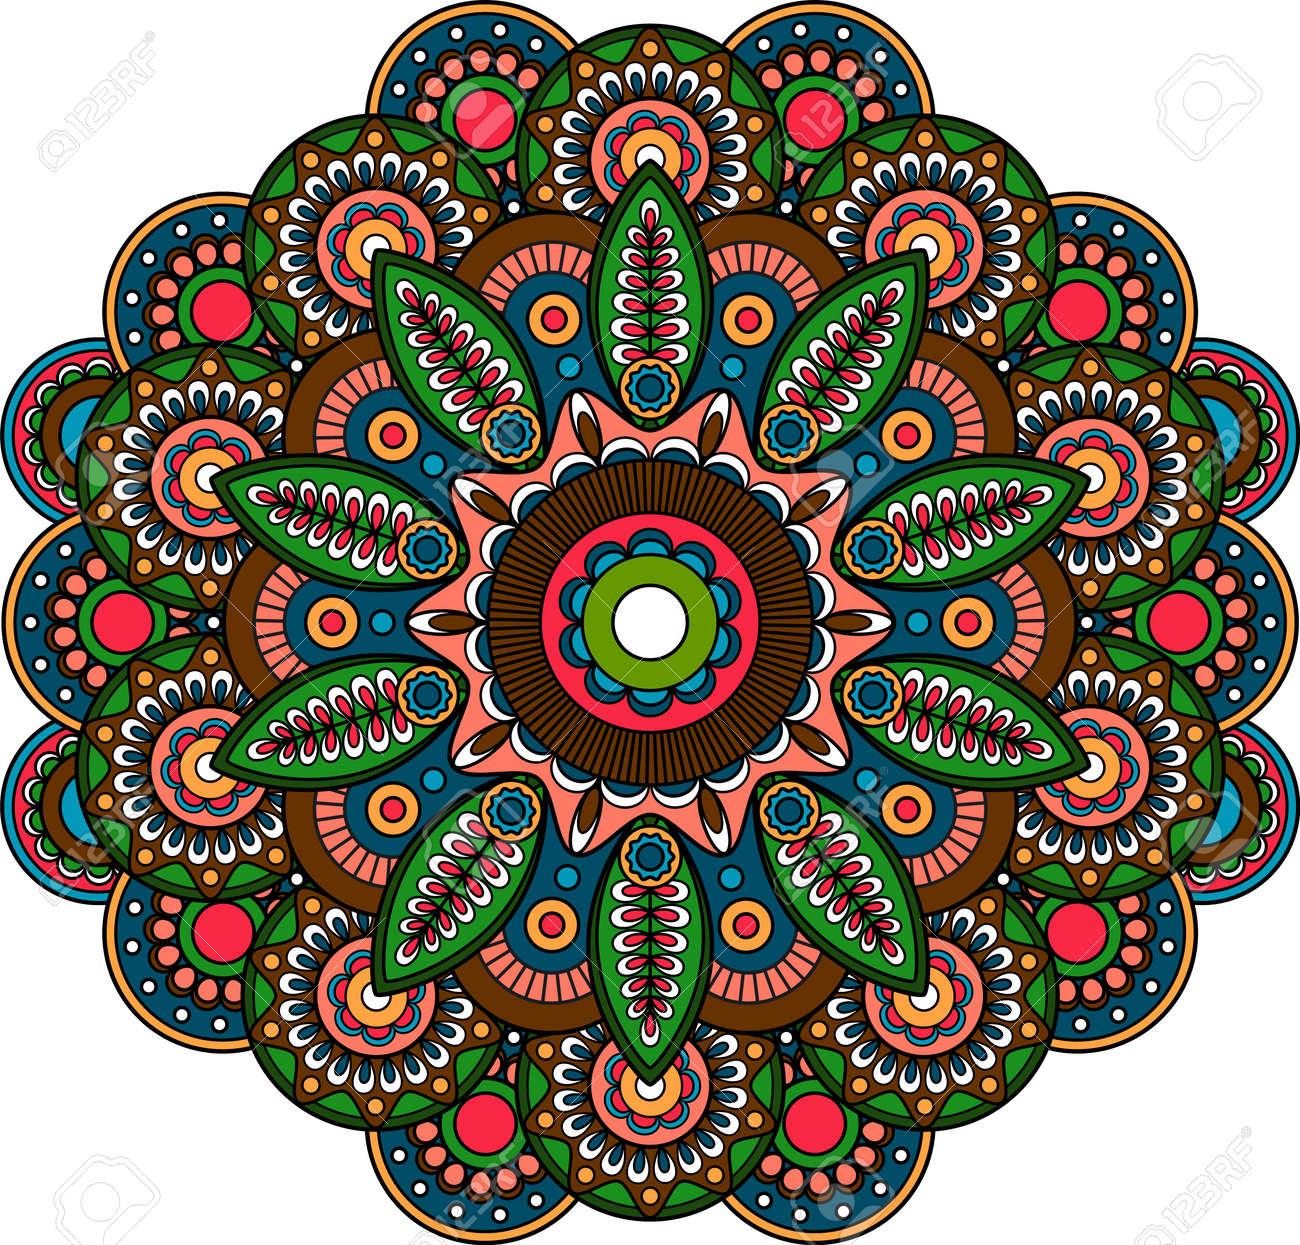 Circular indian bright floral ornament mandala paisley design art - 170995171